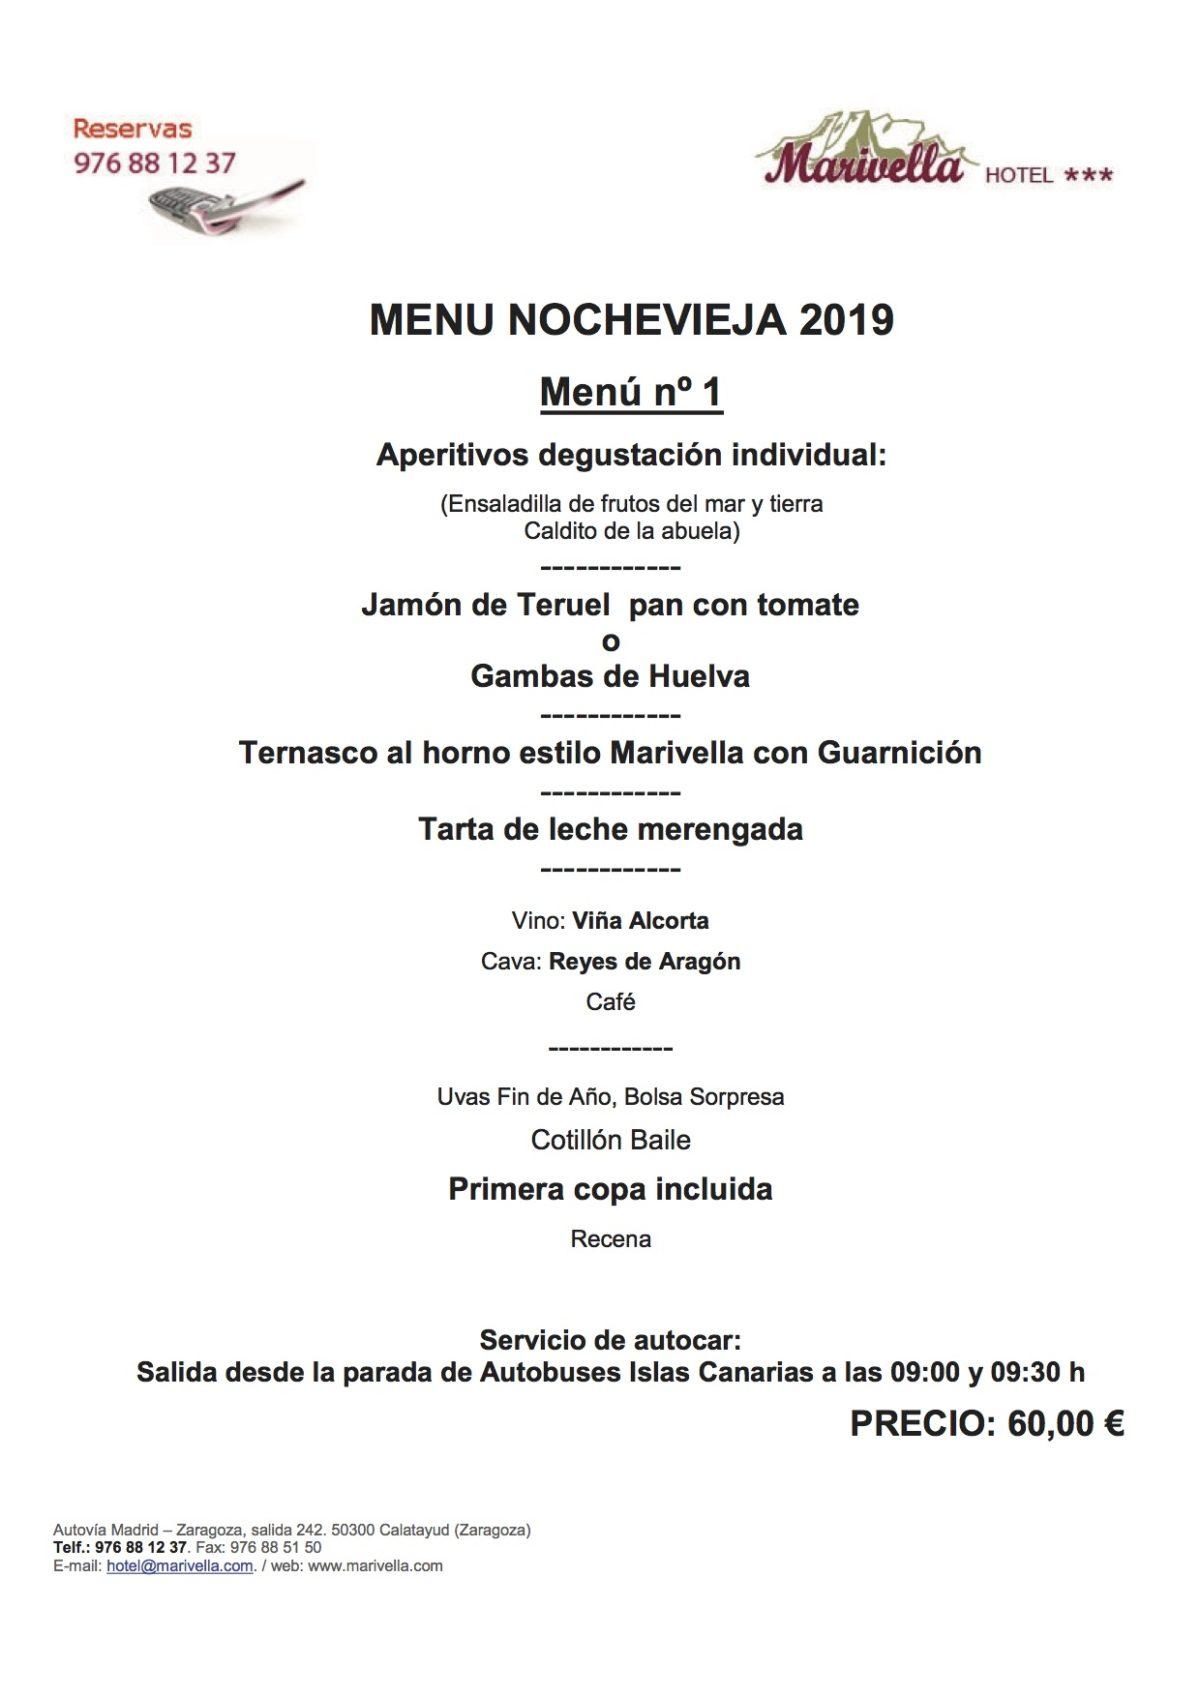 2019-MENU-NOCHEVIEJA-1-1200x1697.jpg